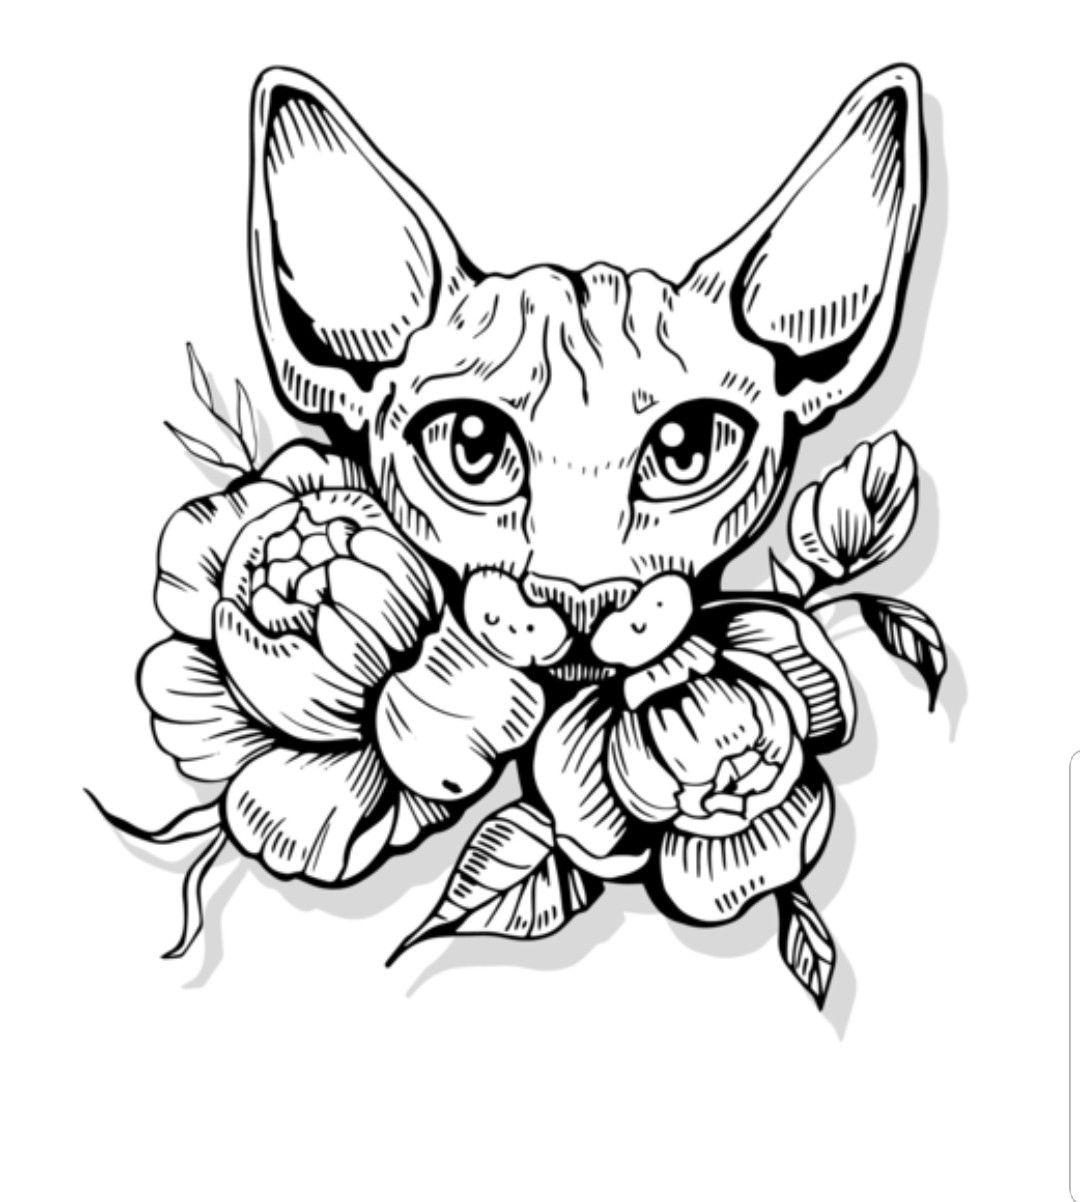 Pin by Briyanna Carroll on Color Me Sane   Animal tattoo ...